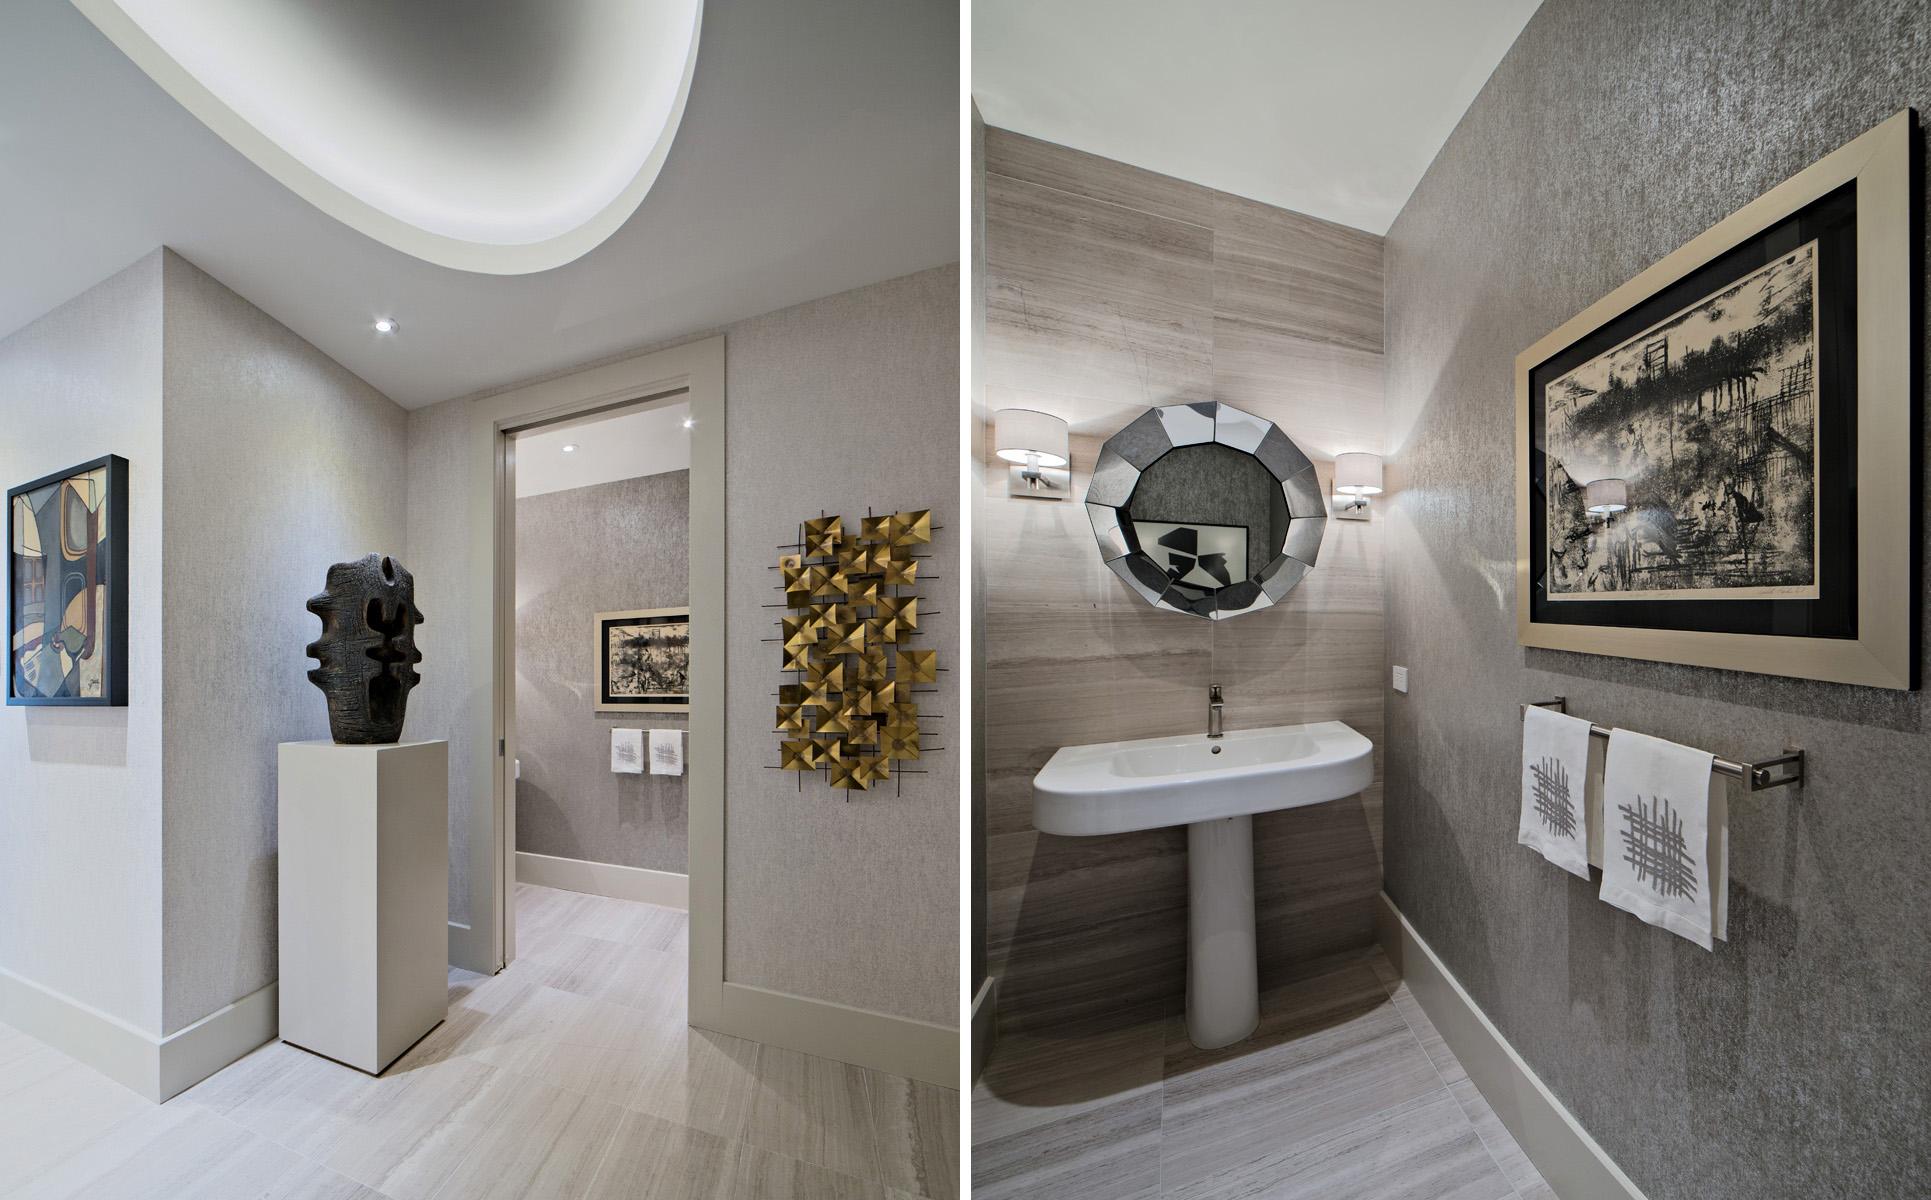 interiors-photography-westmount-condo-Jeffrey-Lamb-001